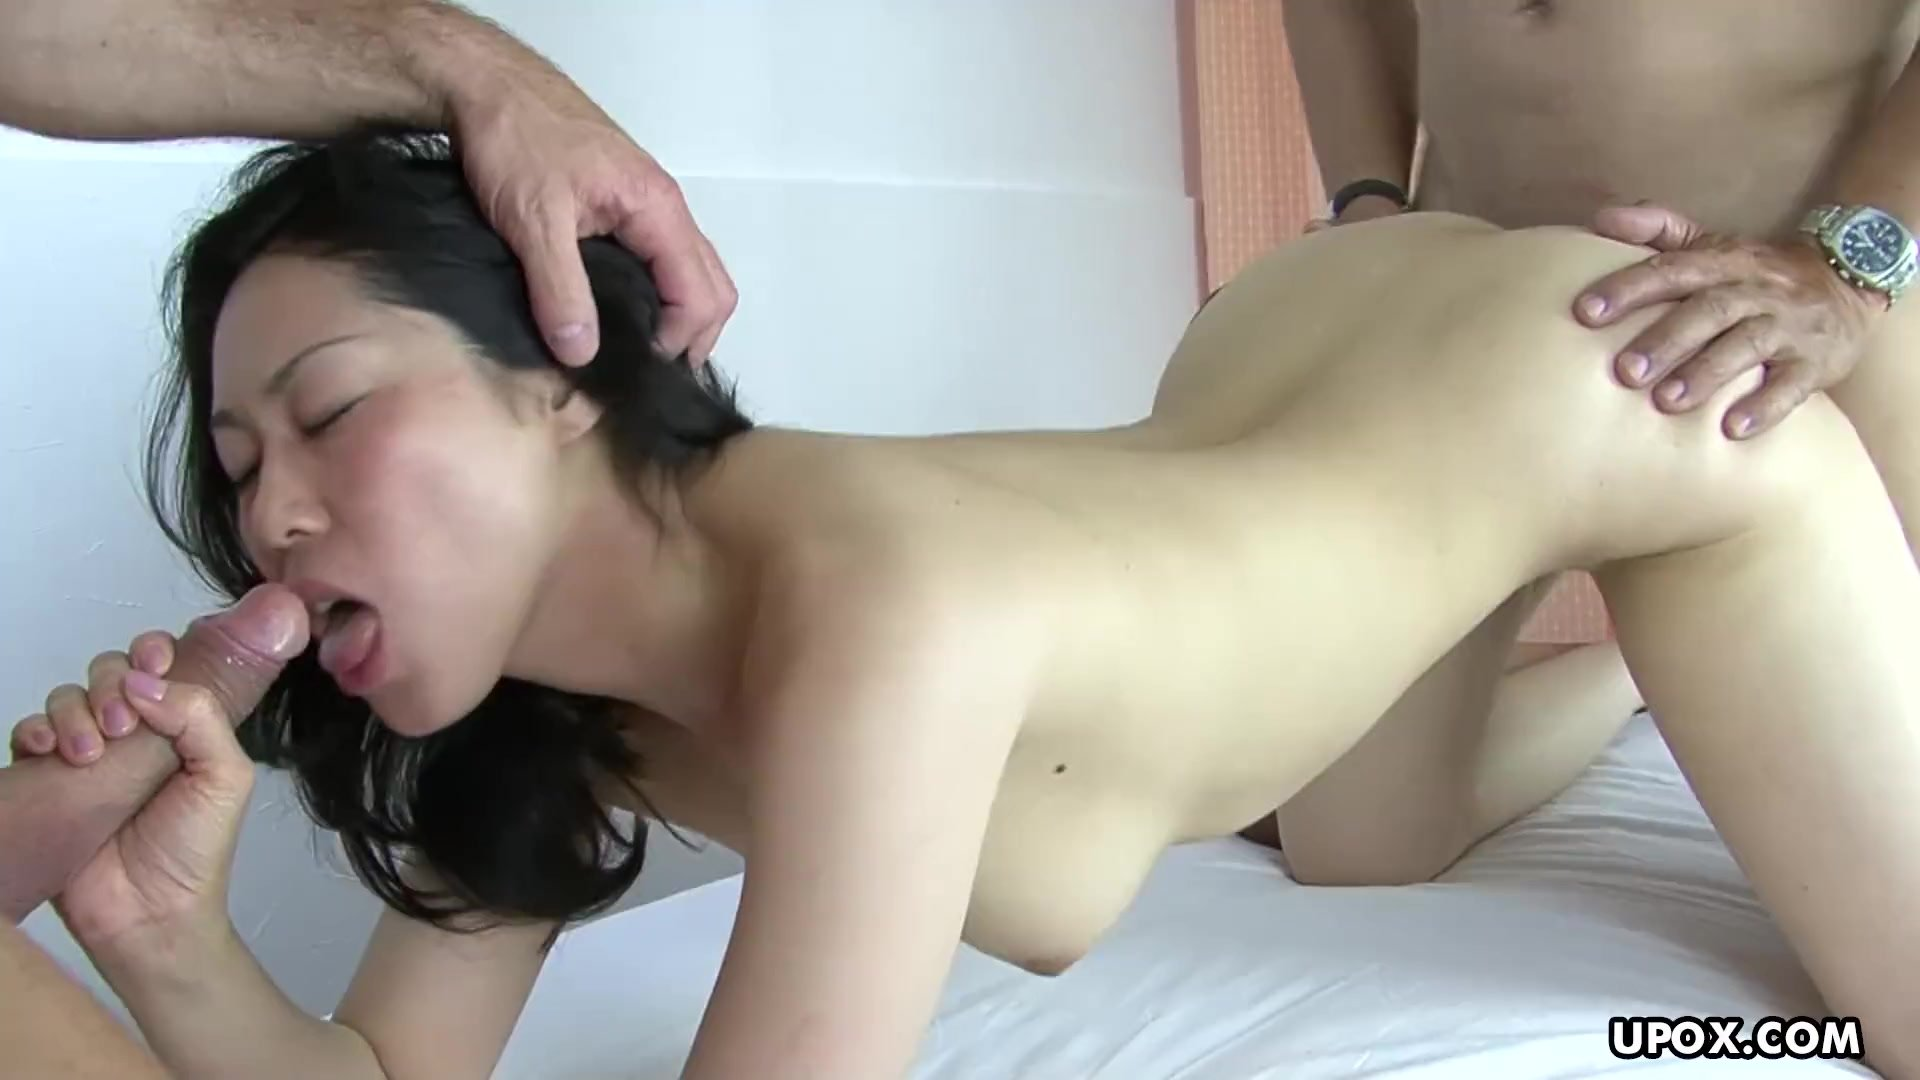 Asian brunette bitch getting her ass fucked like a slut